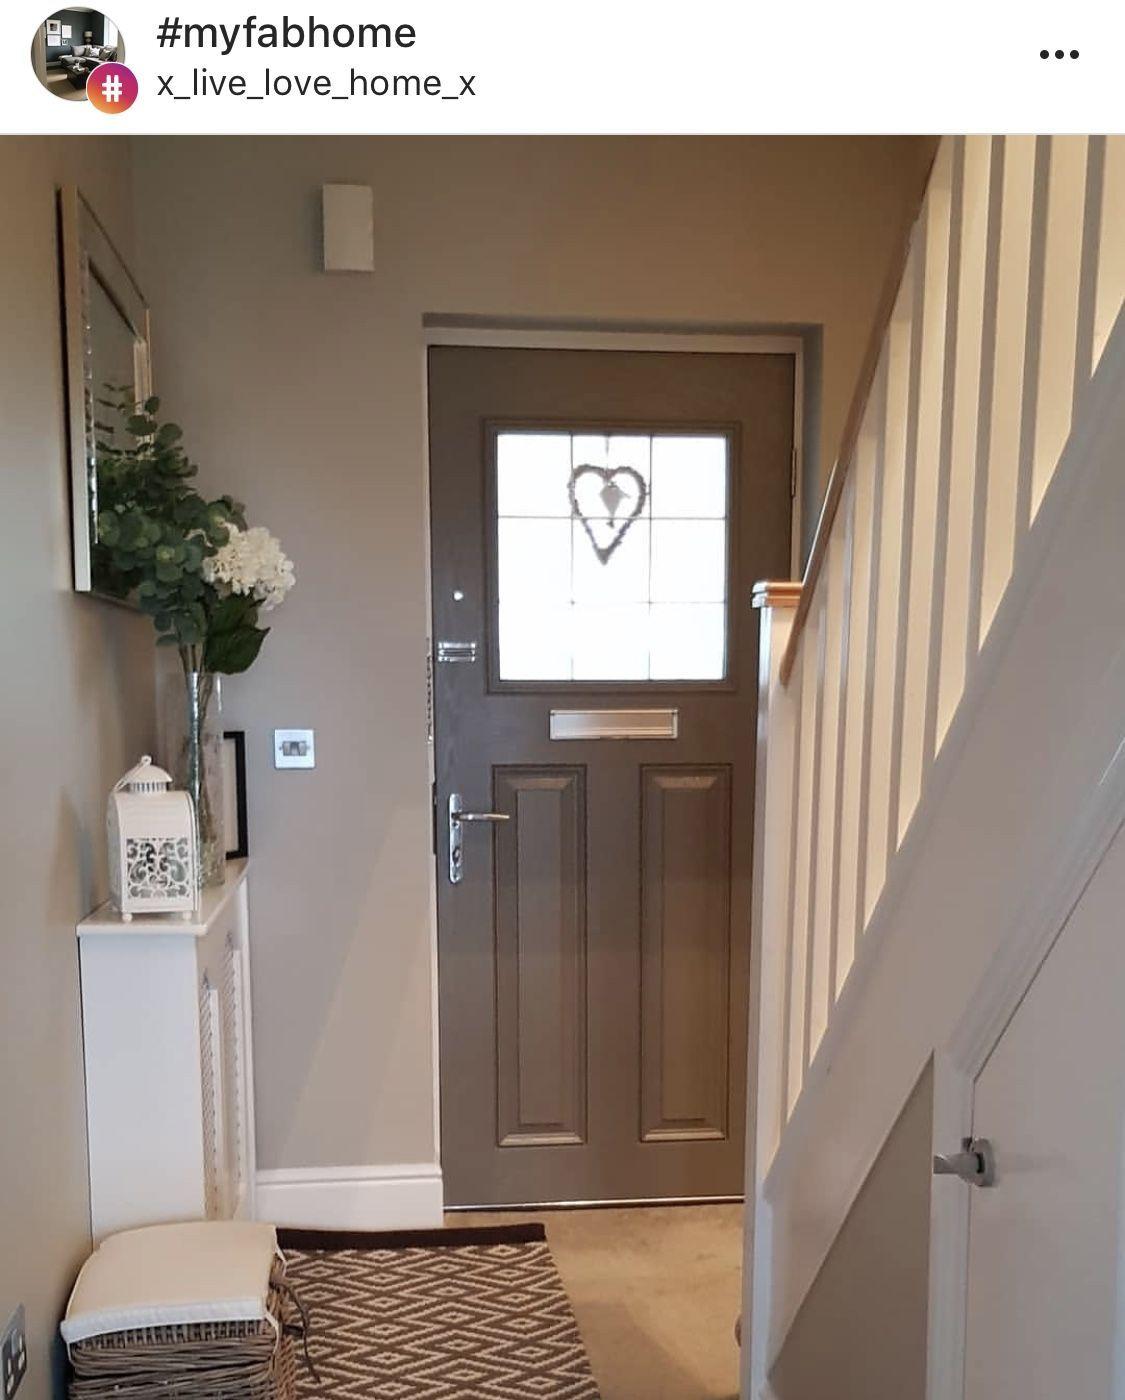 15 Inspiring Small Hallway Ideas Small Entrance Halls Hallway Decorating Small Hallways